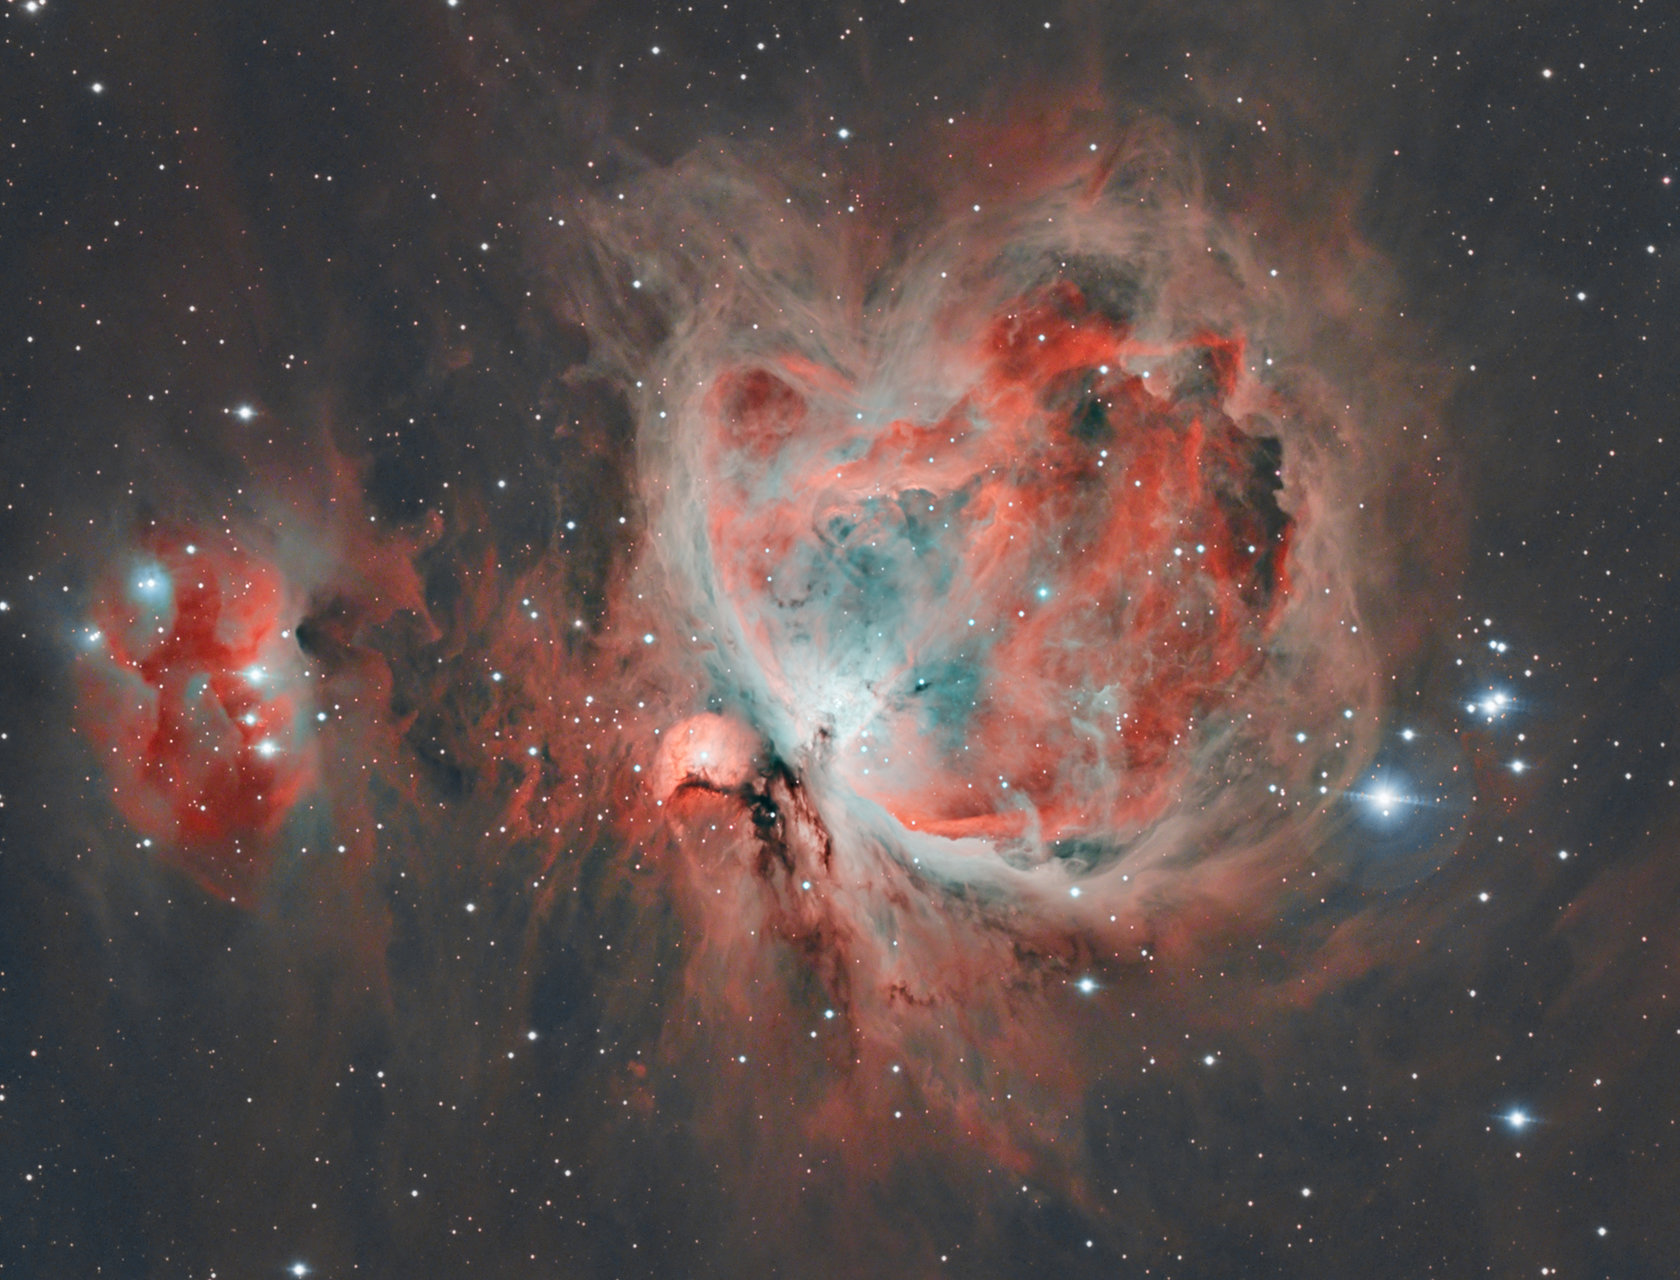 M42 - Великата мъглявина Орион | Author Ivan Raichev - sektor | PHOTO FORUM